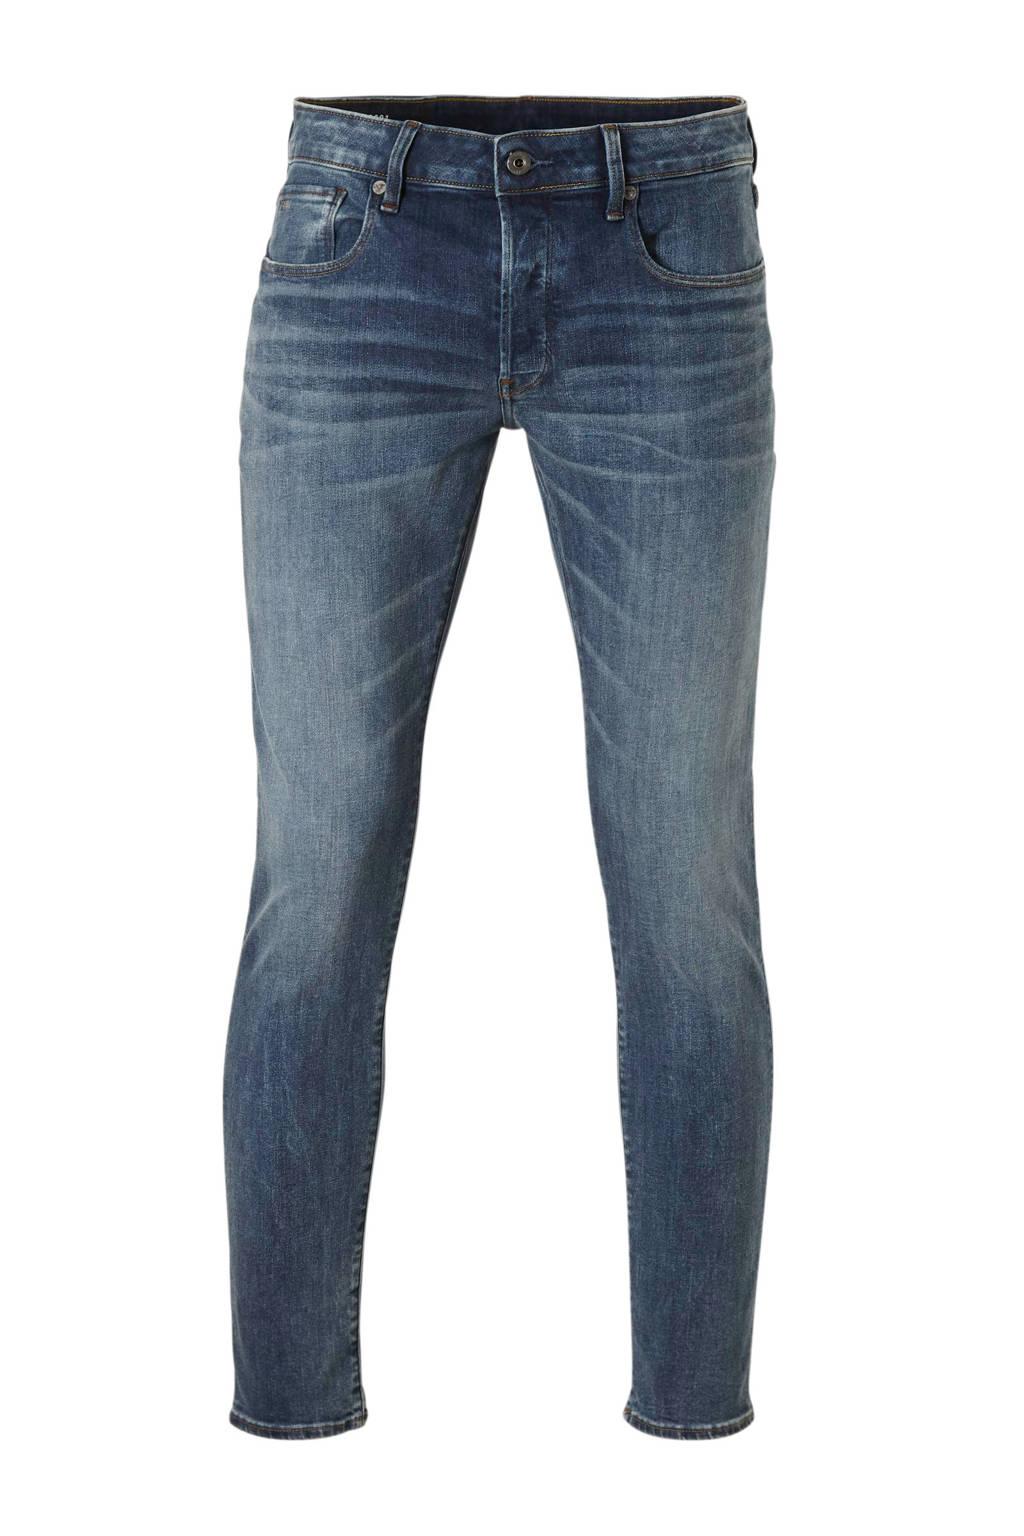 G-Star RAW slim fit jeans 3301, Dark denim